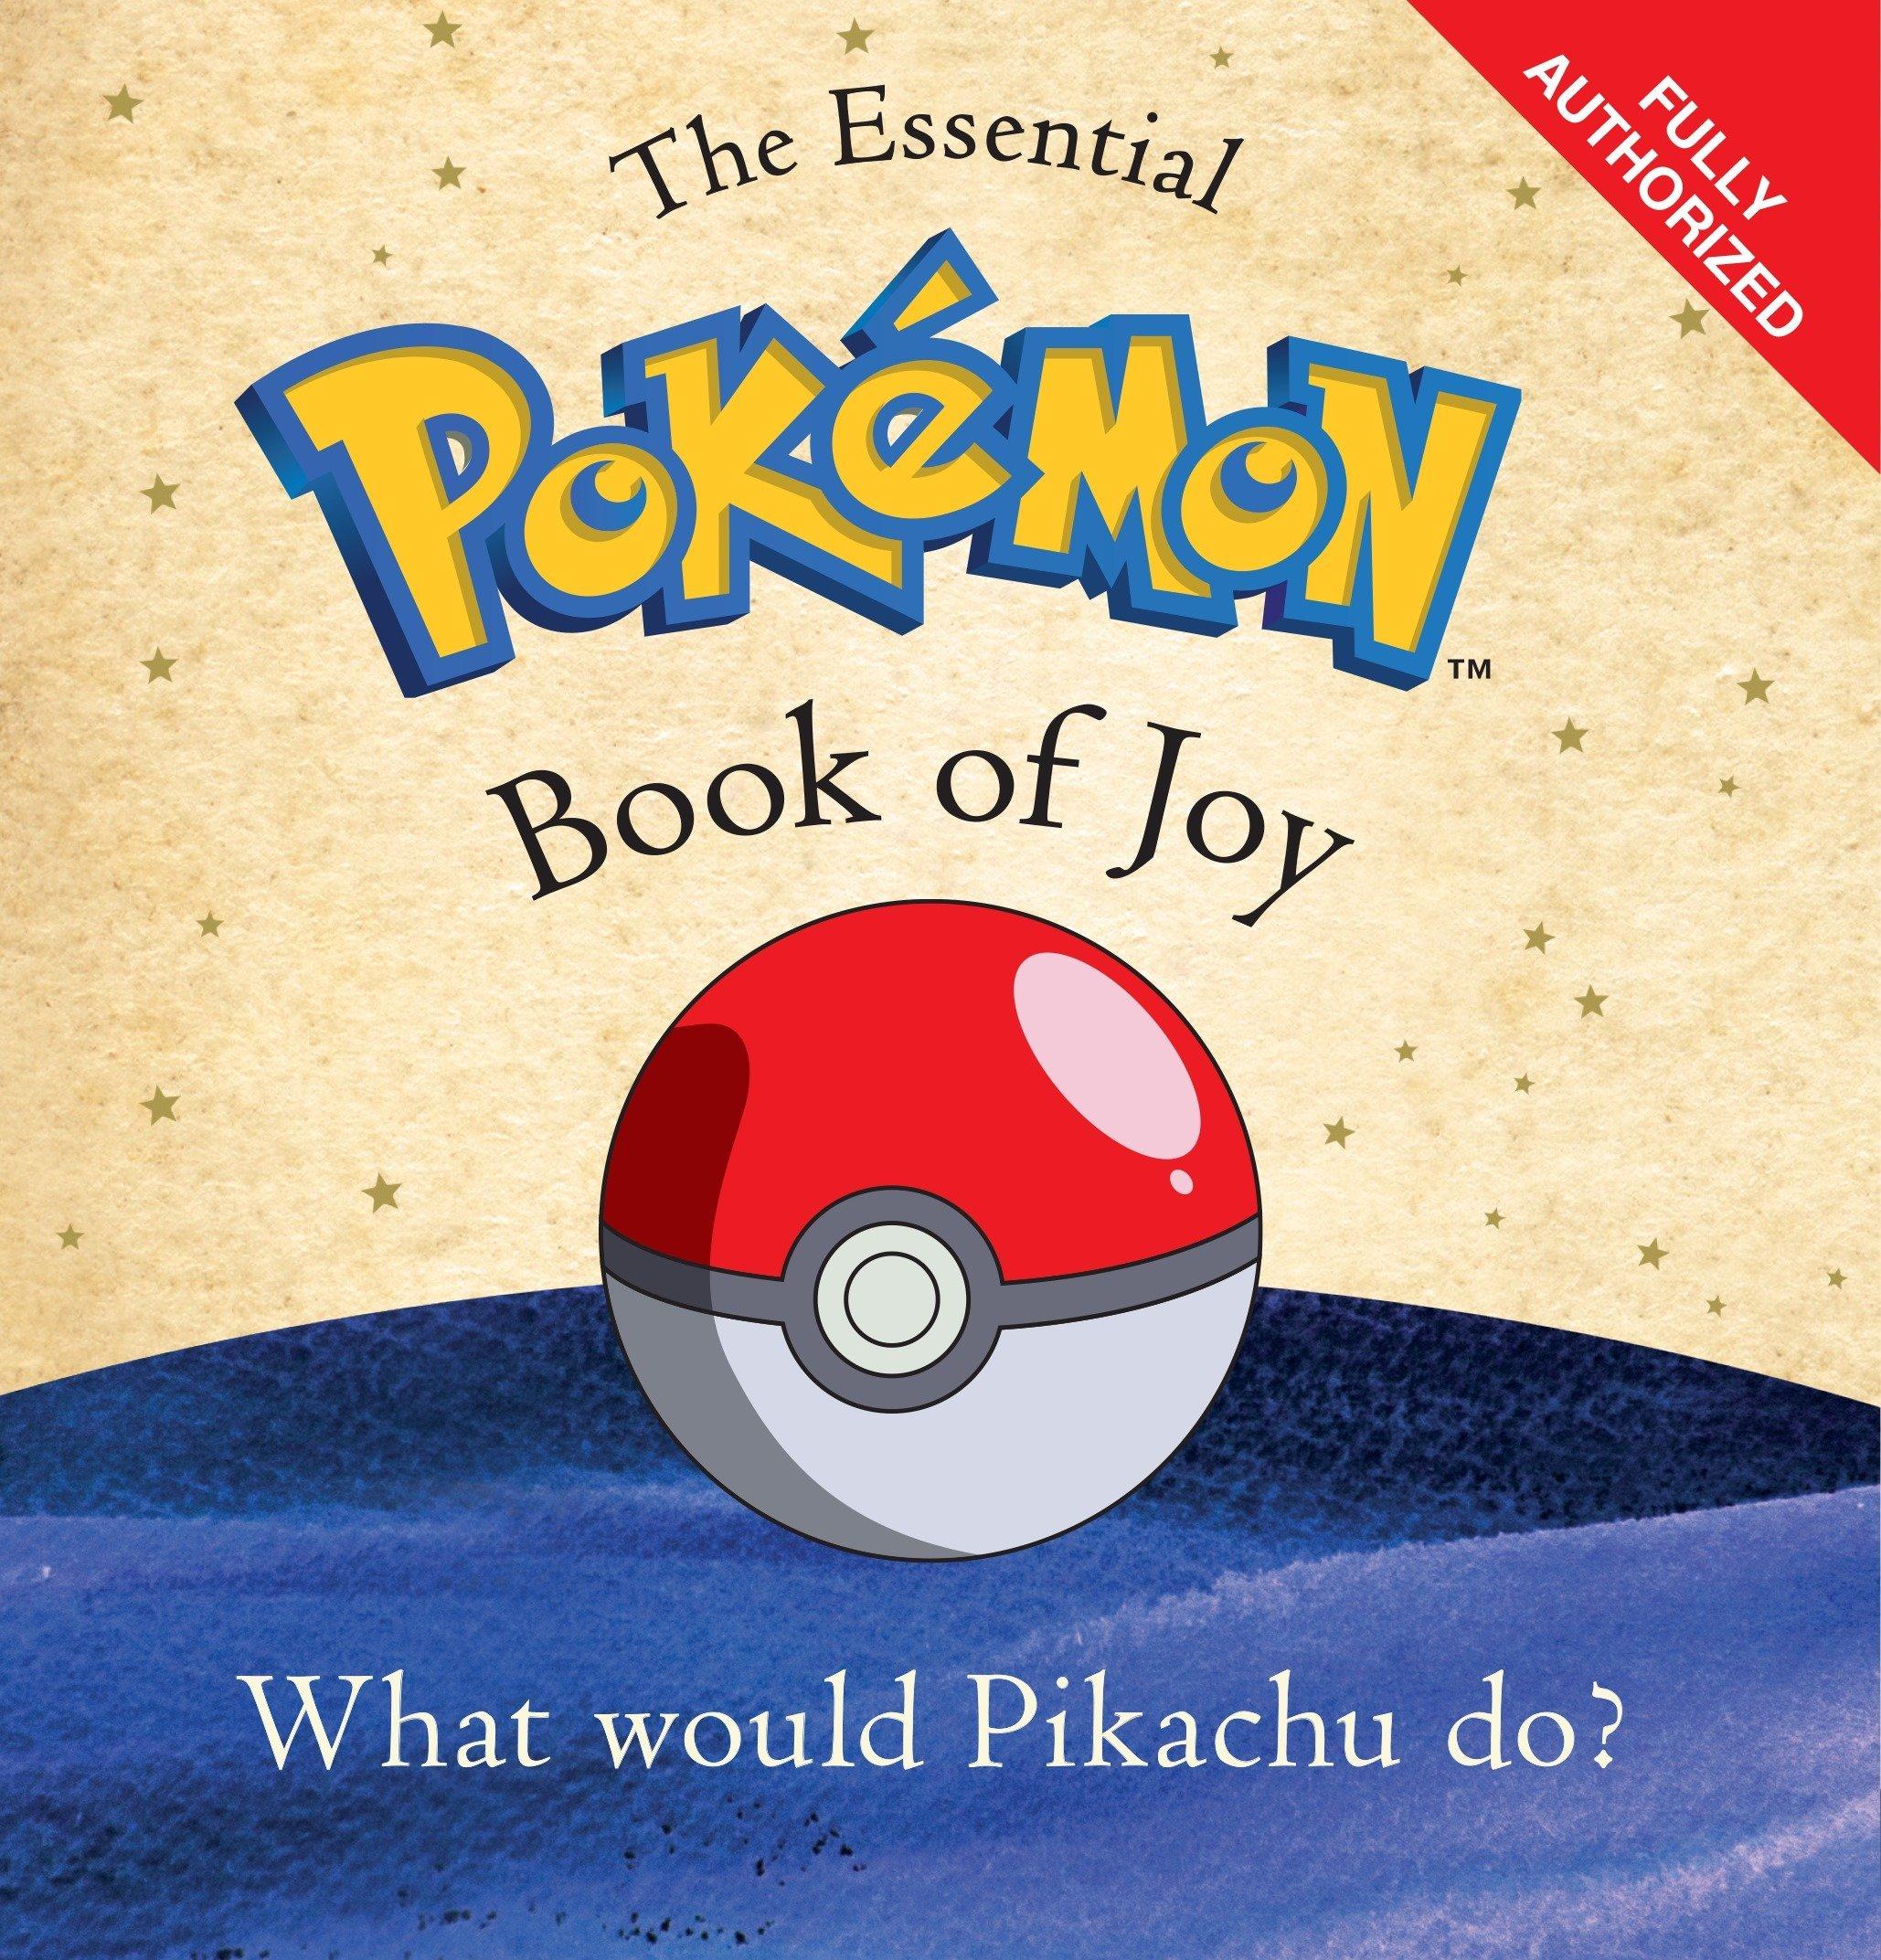 The Essential Pokémon Book of Joy: Amazon.de: Pokémon ...